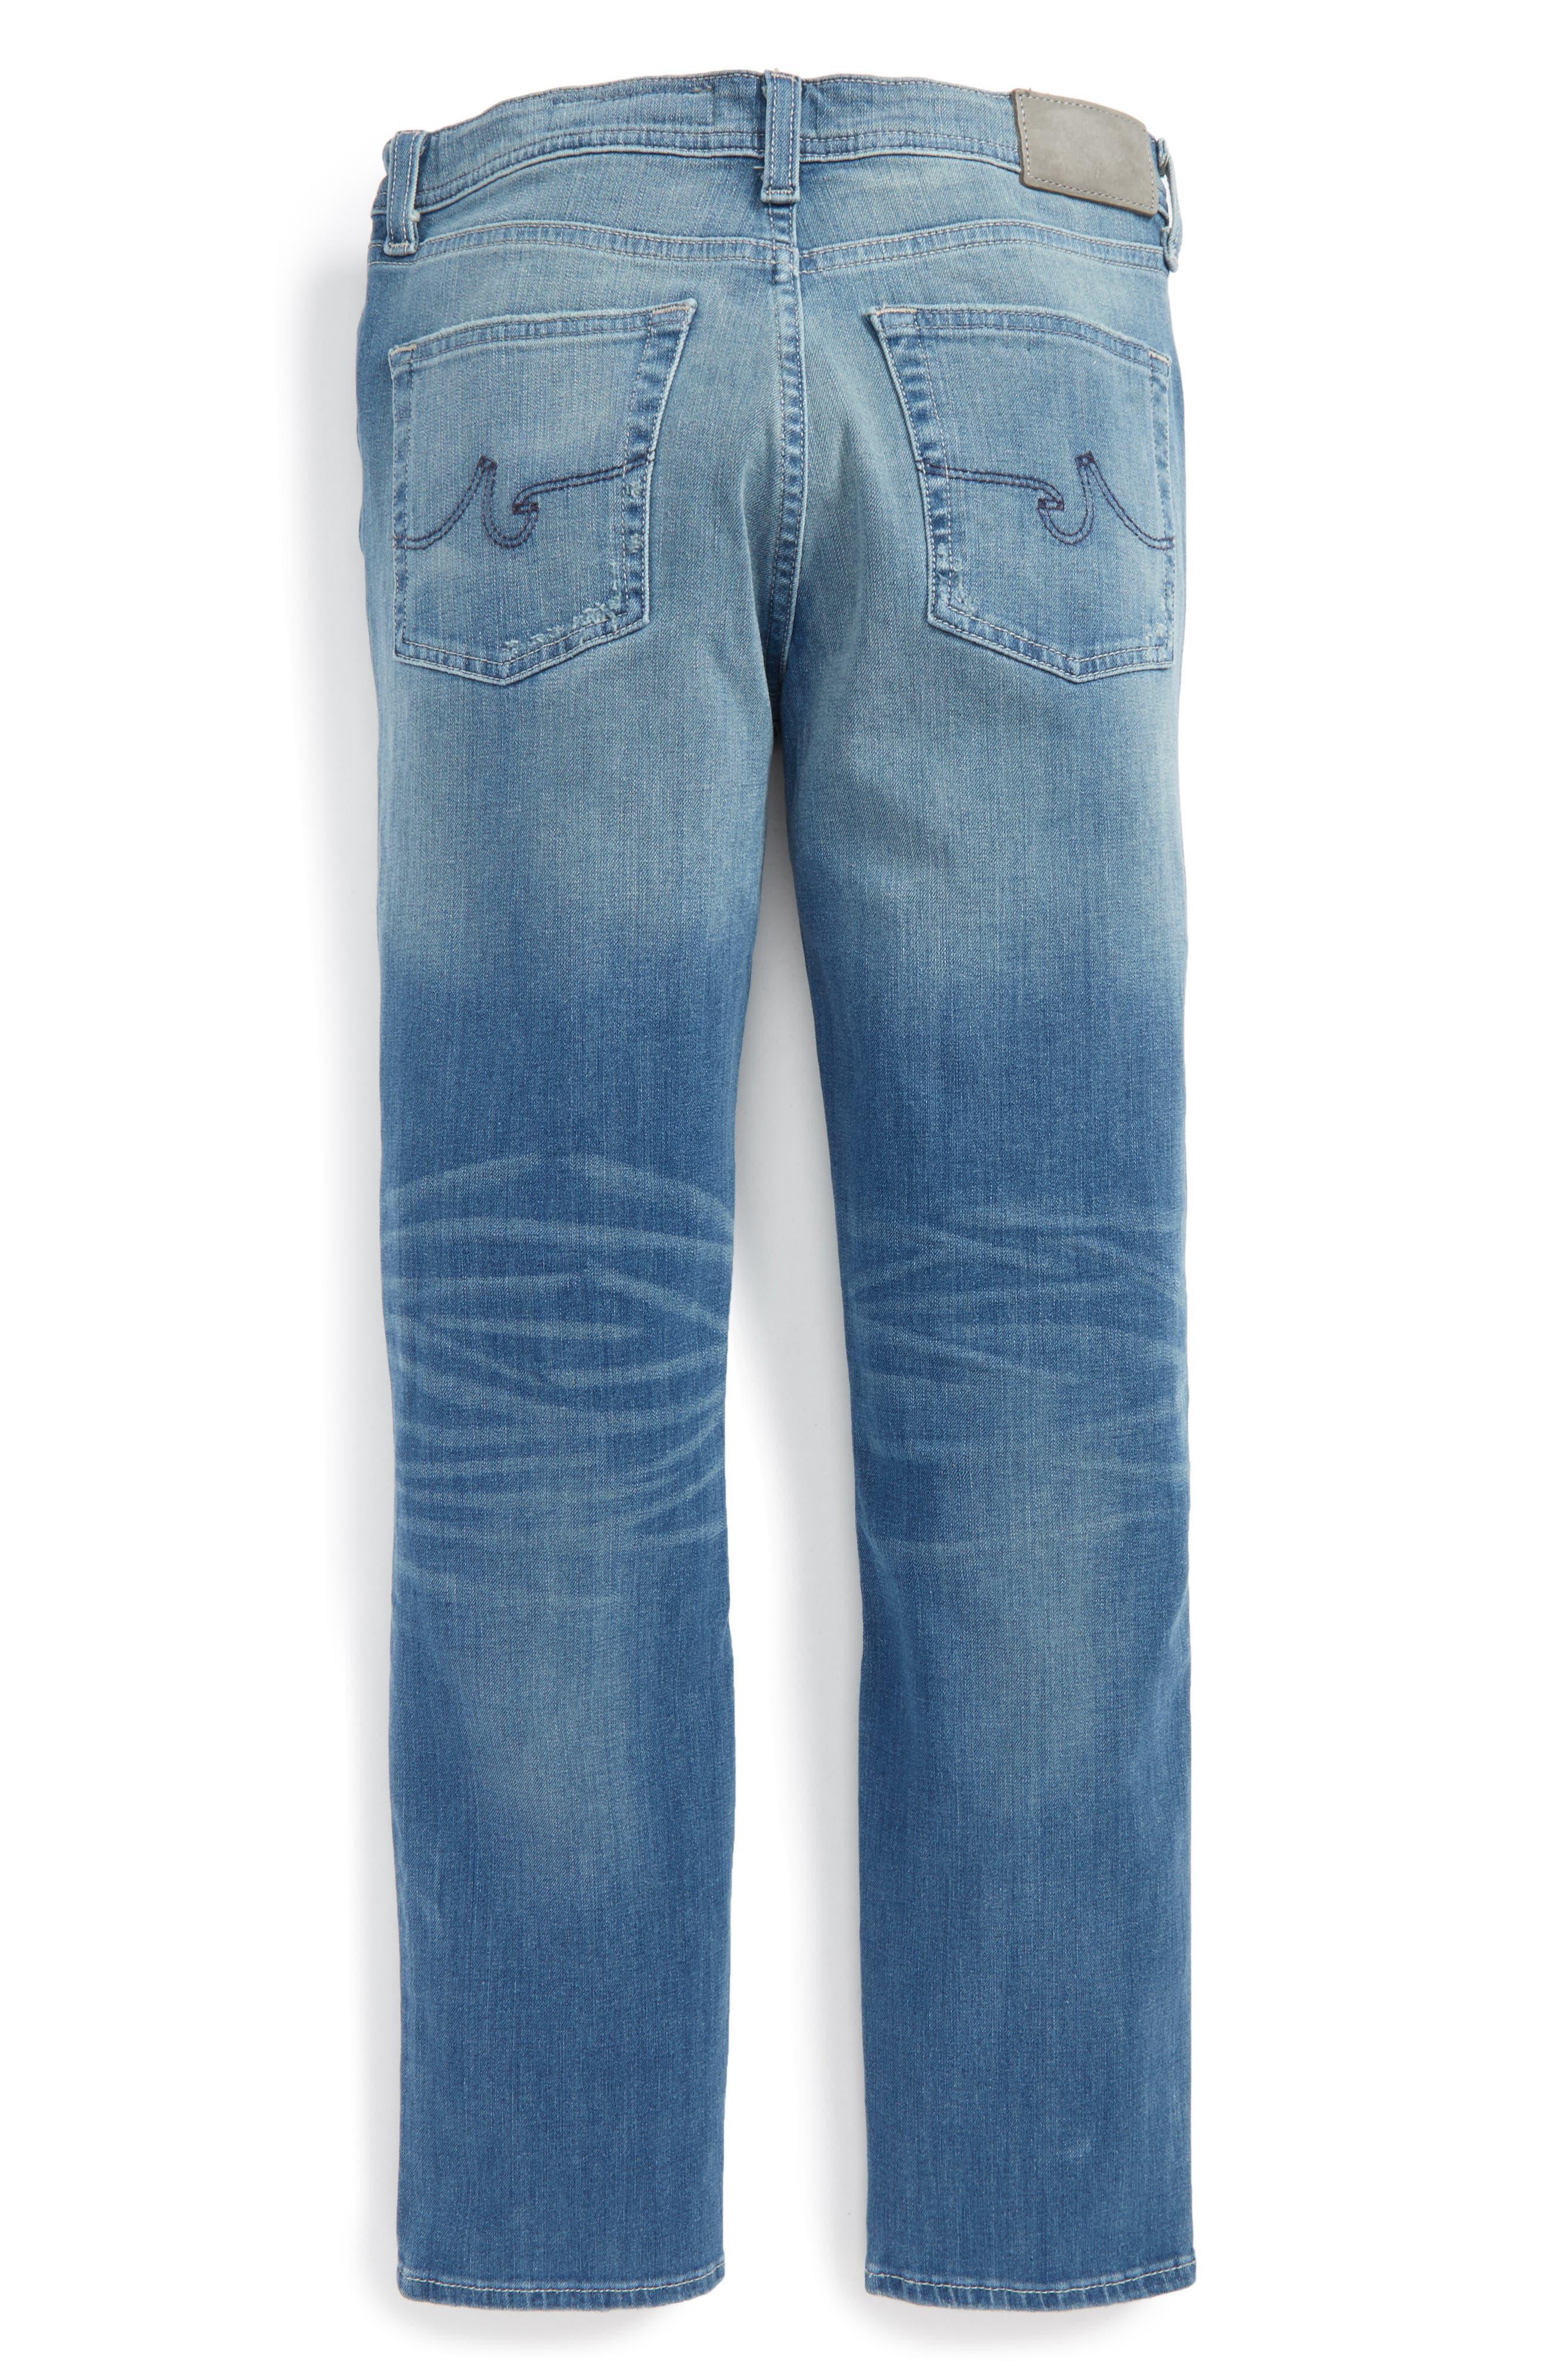 Alternate Image 2  - ag adriano goldschmied kids The Noah Slim Straight Leg Jeans (Big Boys)